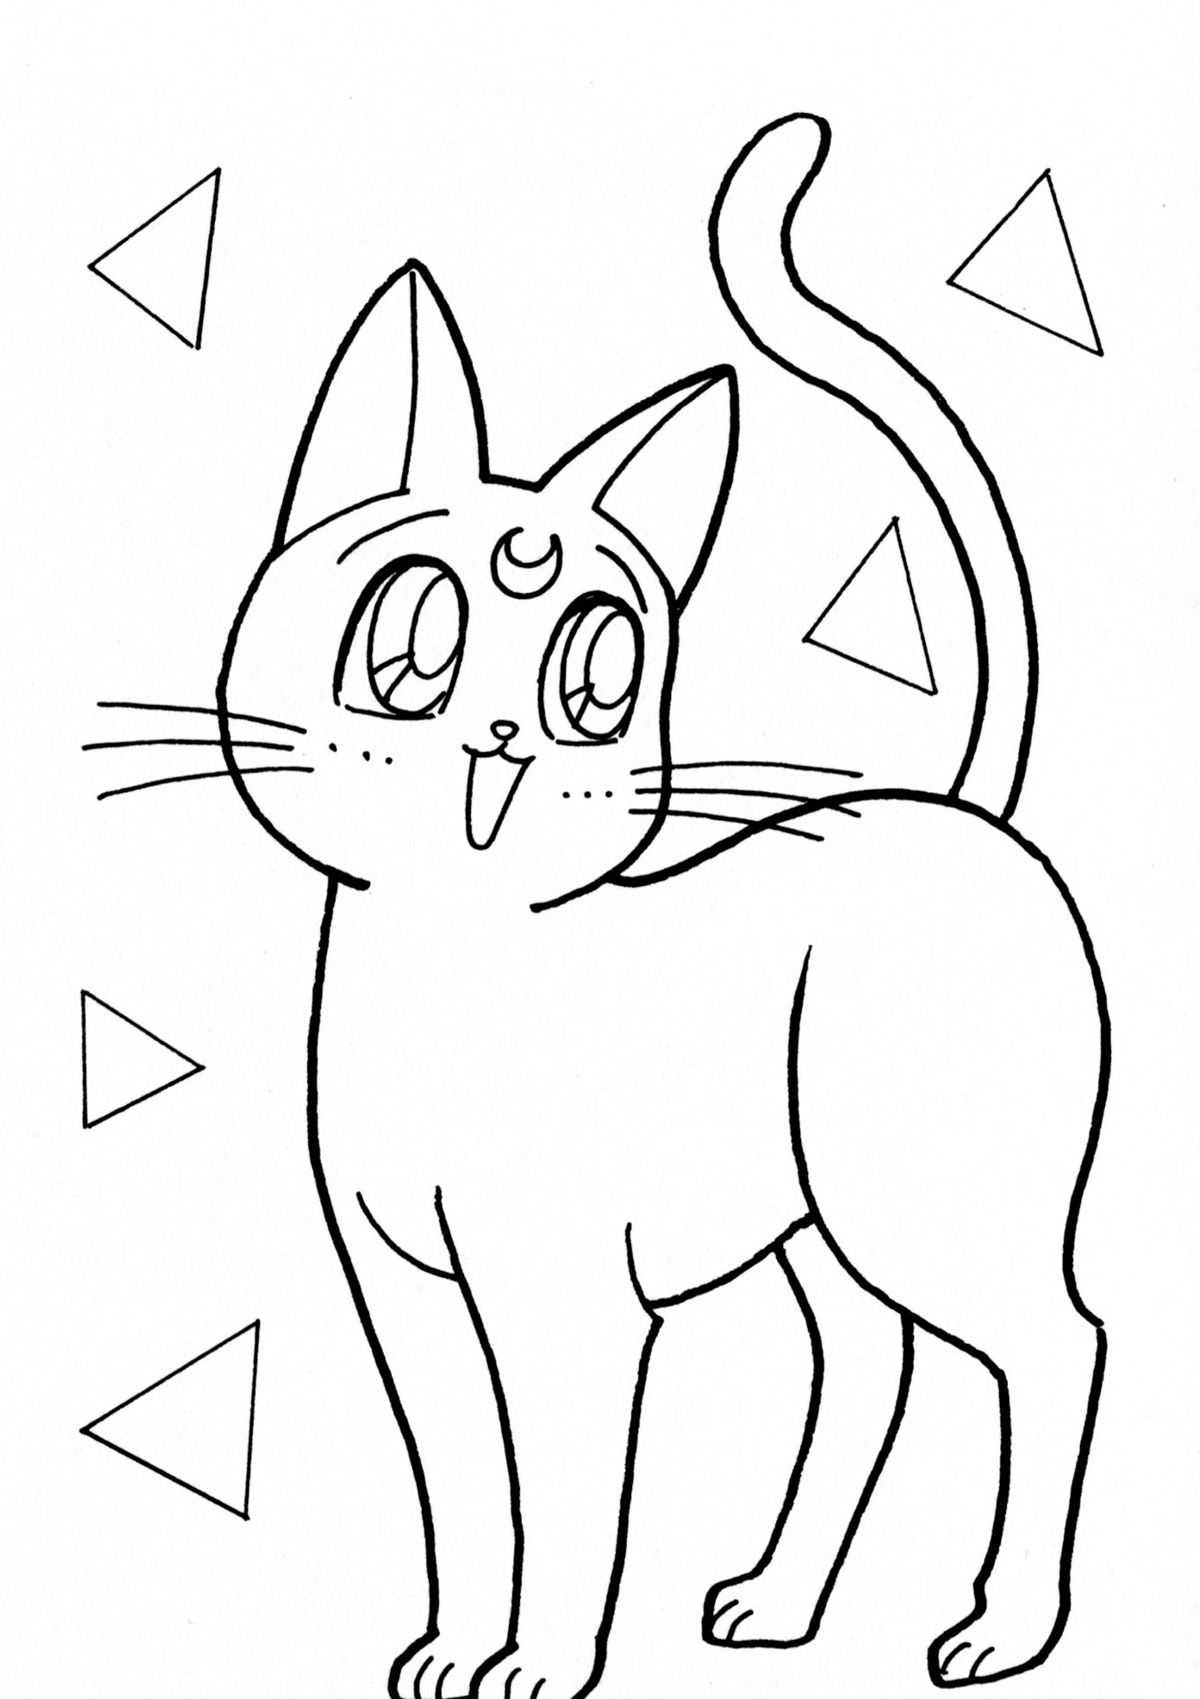 cats009.jpg (1200×1699) | Manualidades | Pinterest | Dibujos fáciles ...